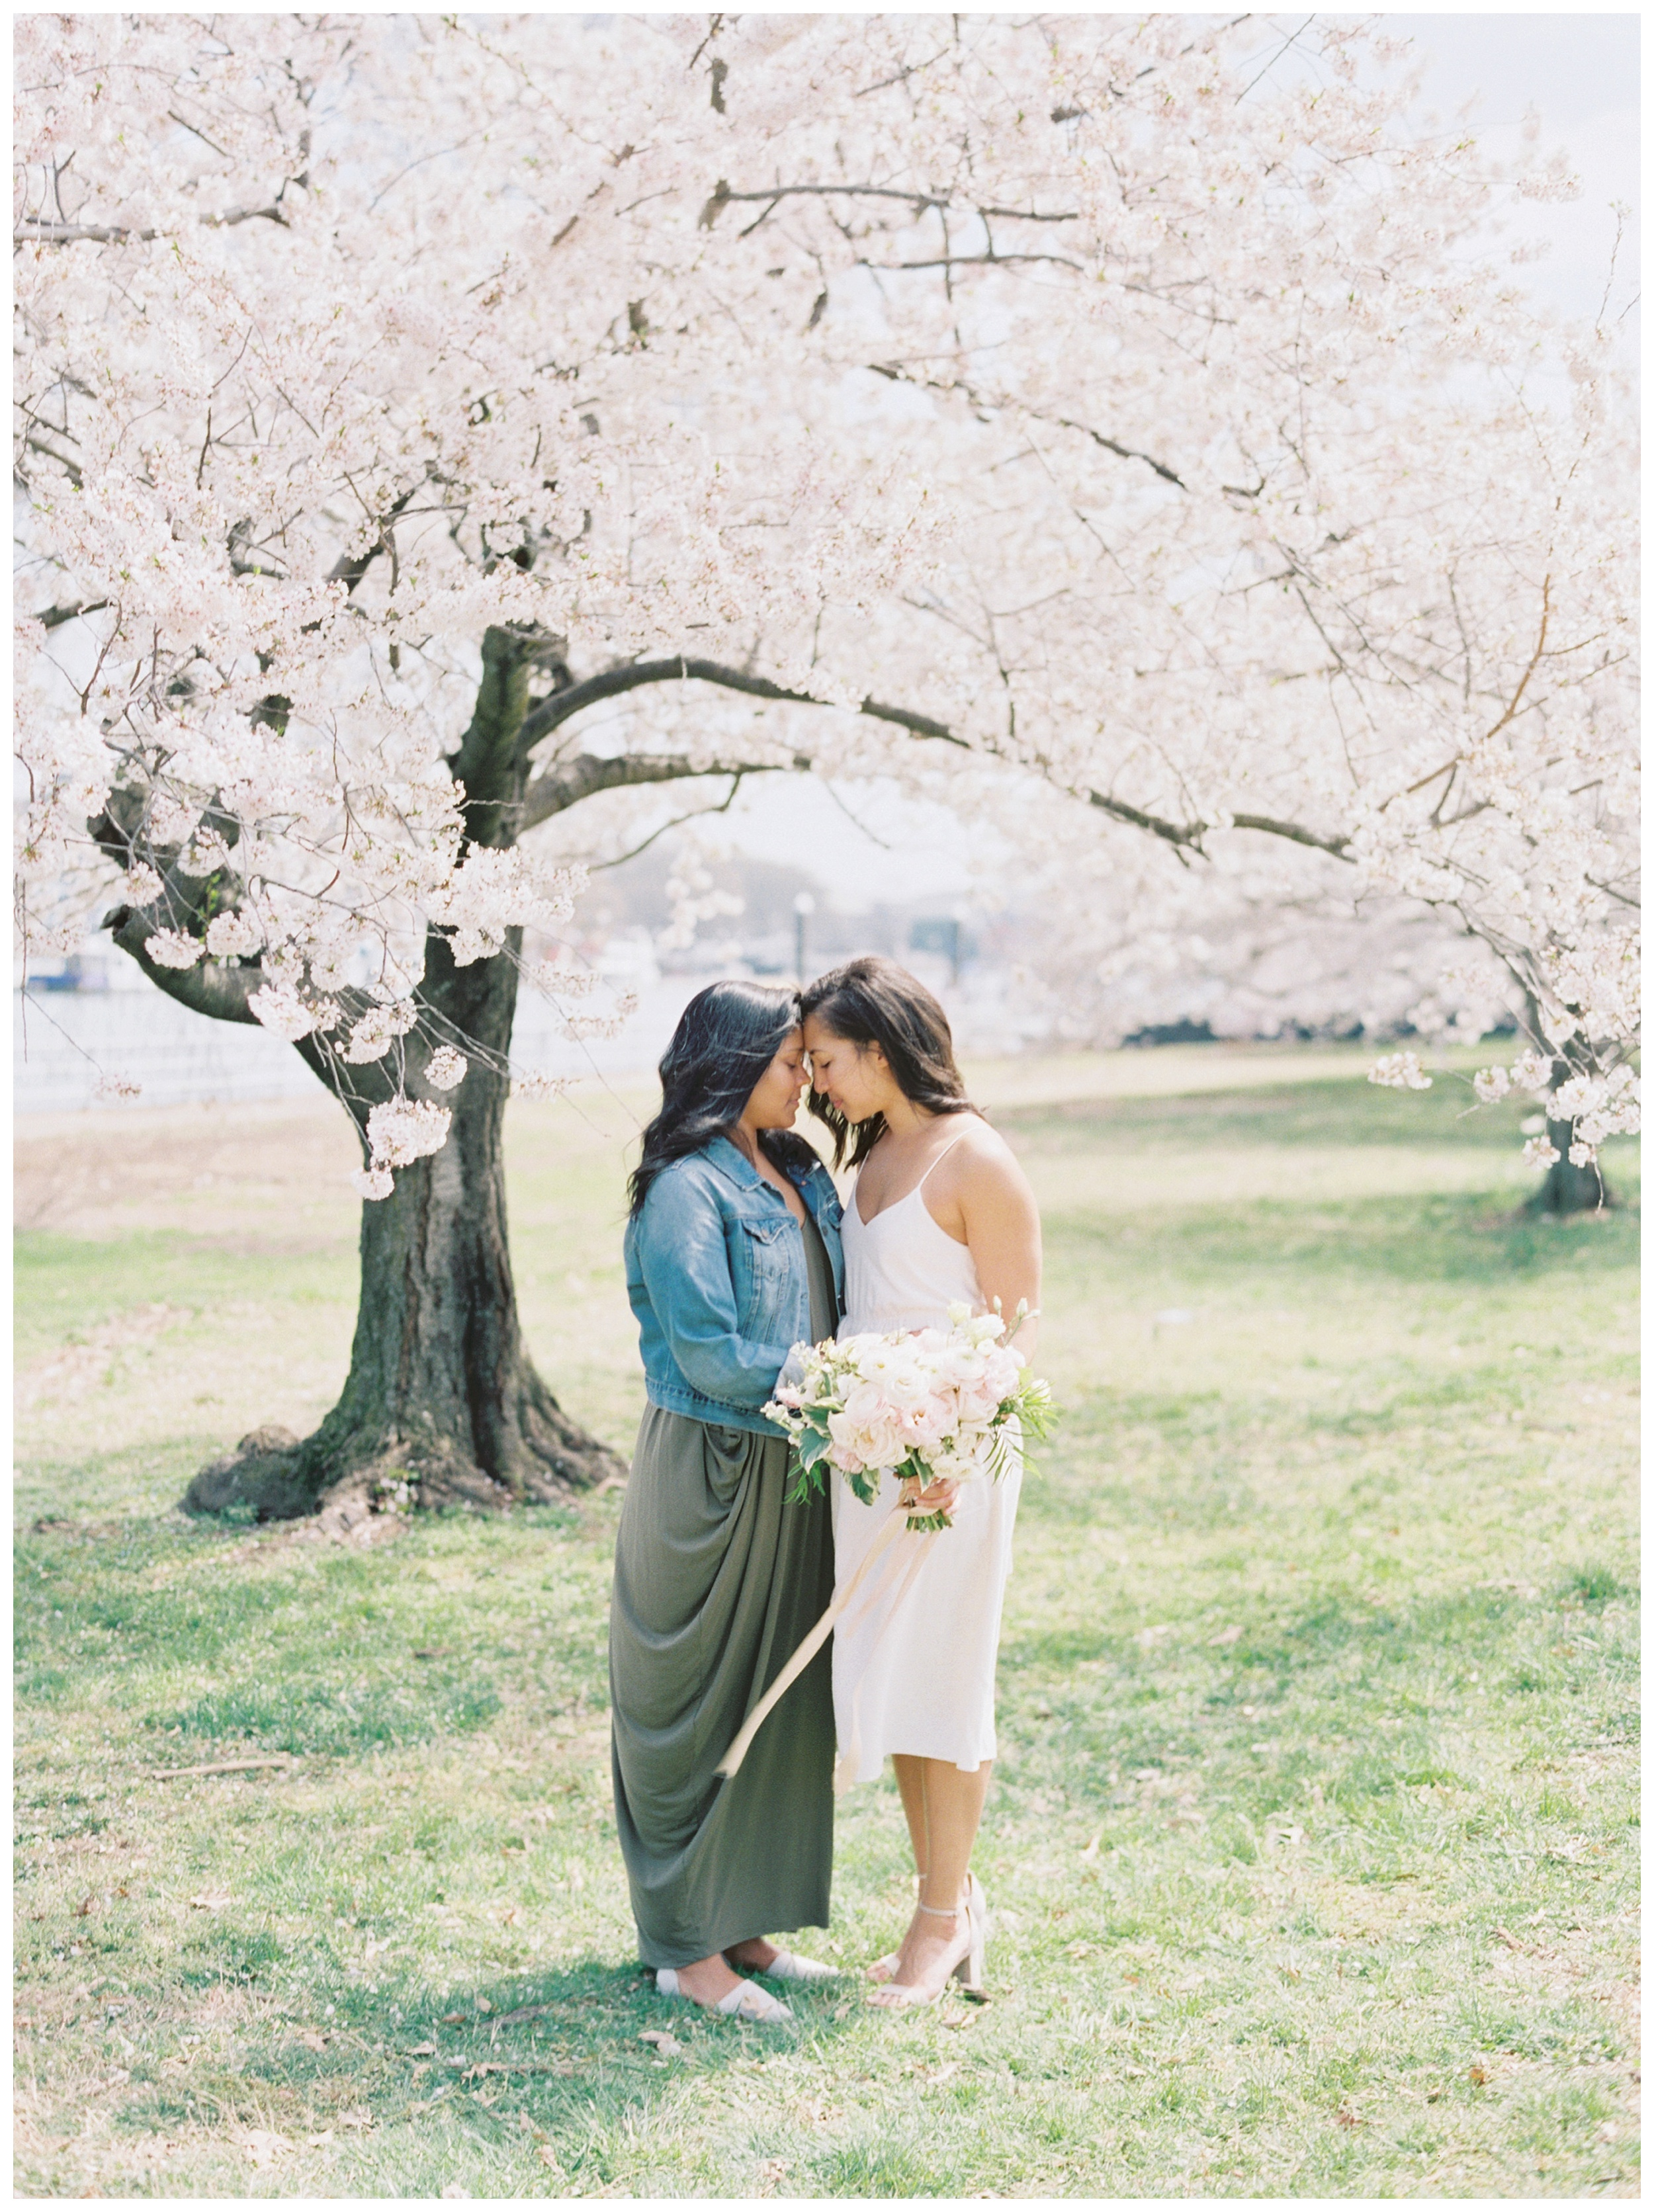 Same Sex DC Engagement | District of Columbia Cherry Blossom Engagement Kir Tuben_0001.jpg